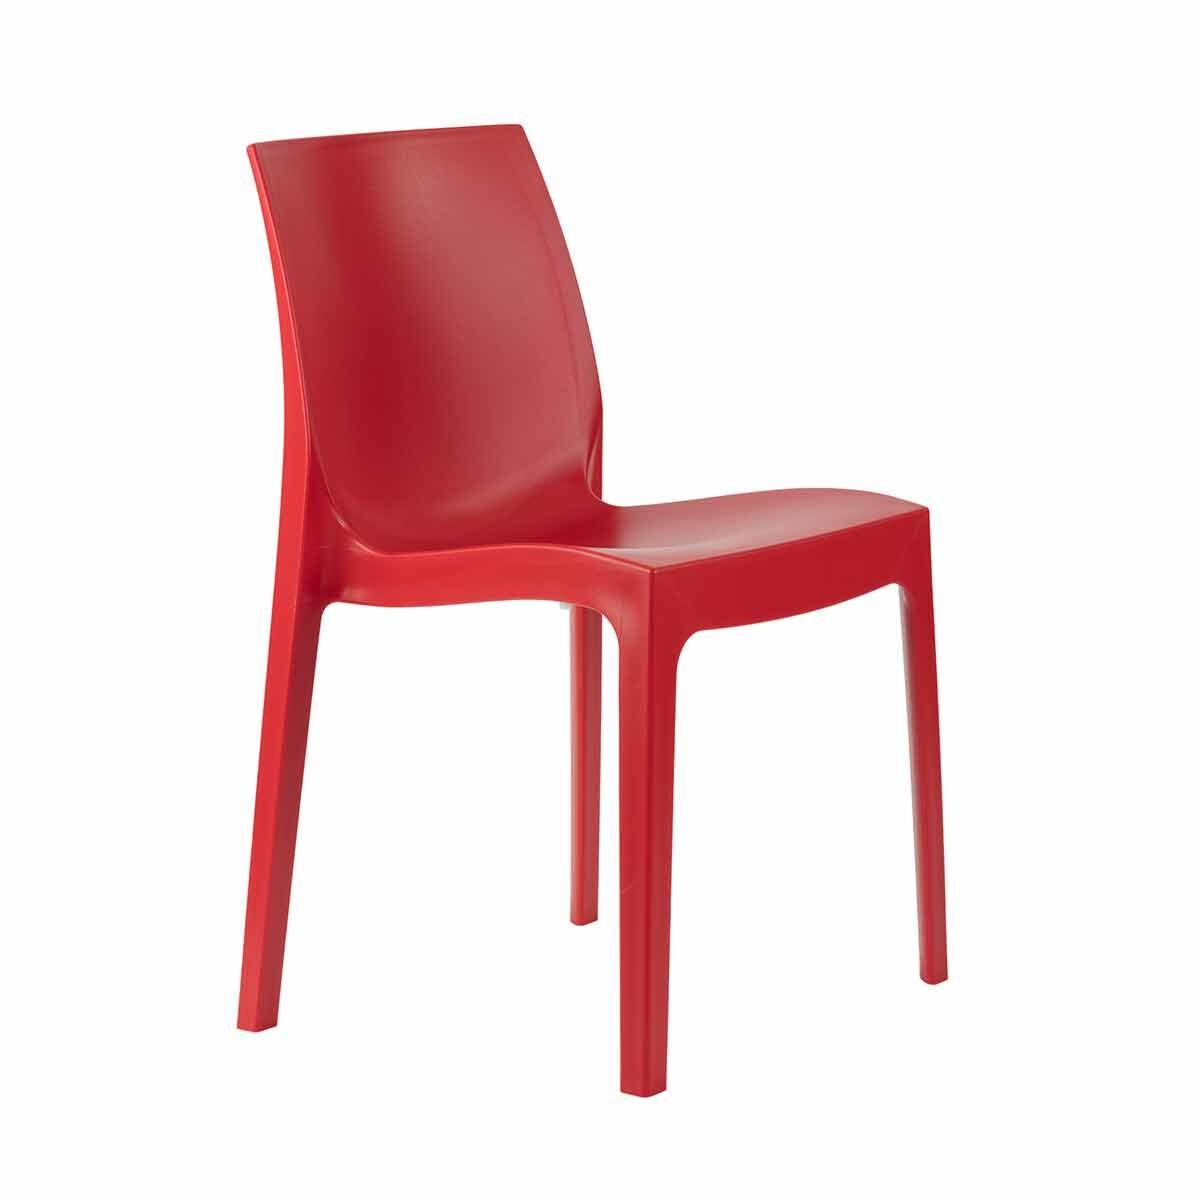 Tabilo Strata Polypropylene Stacking Chair Red